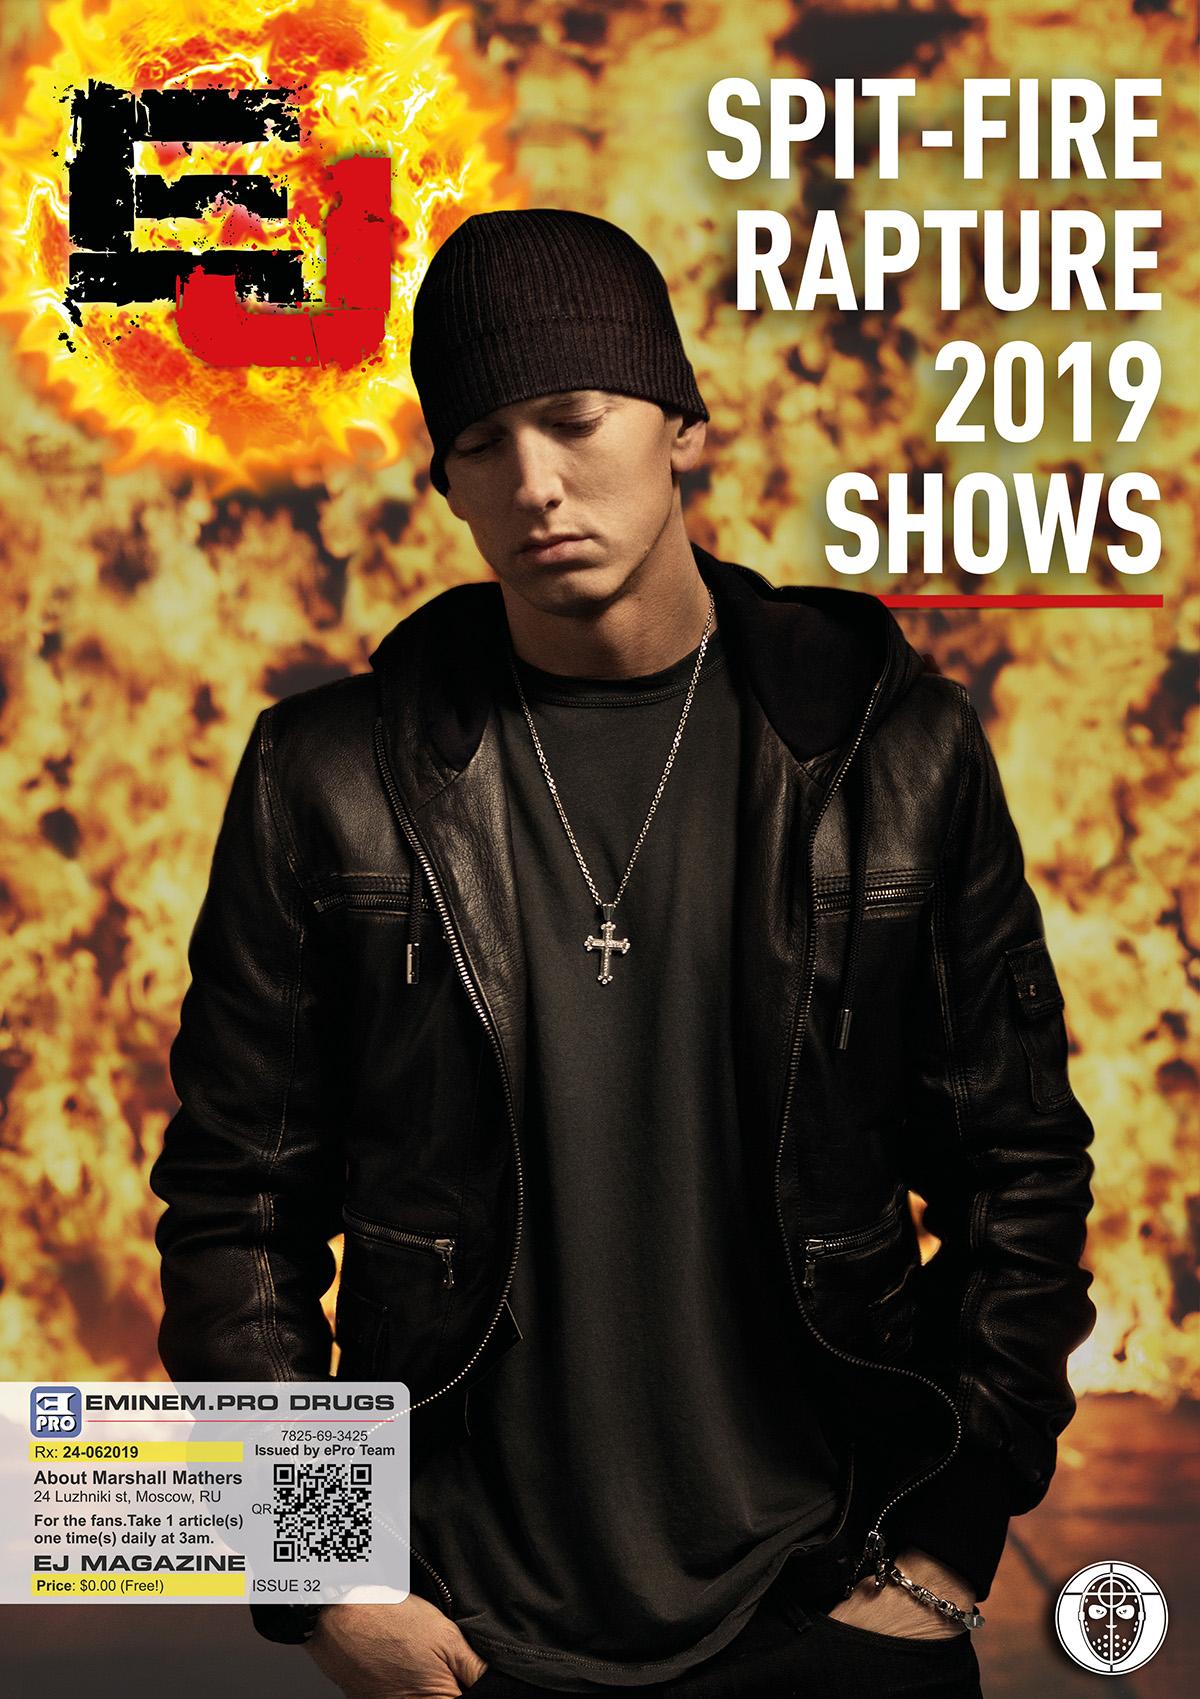 EJ Magazine #32 Cover 1 ePro Exclusive